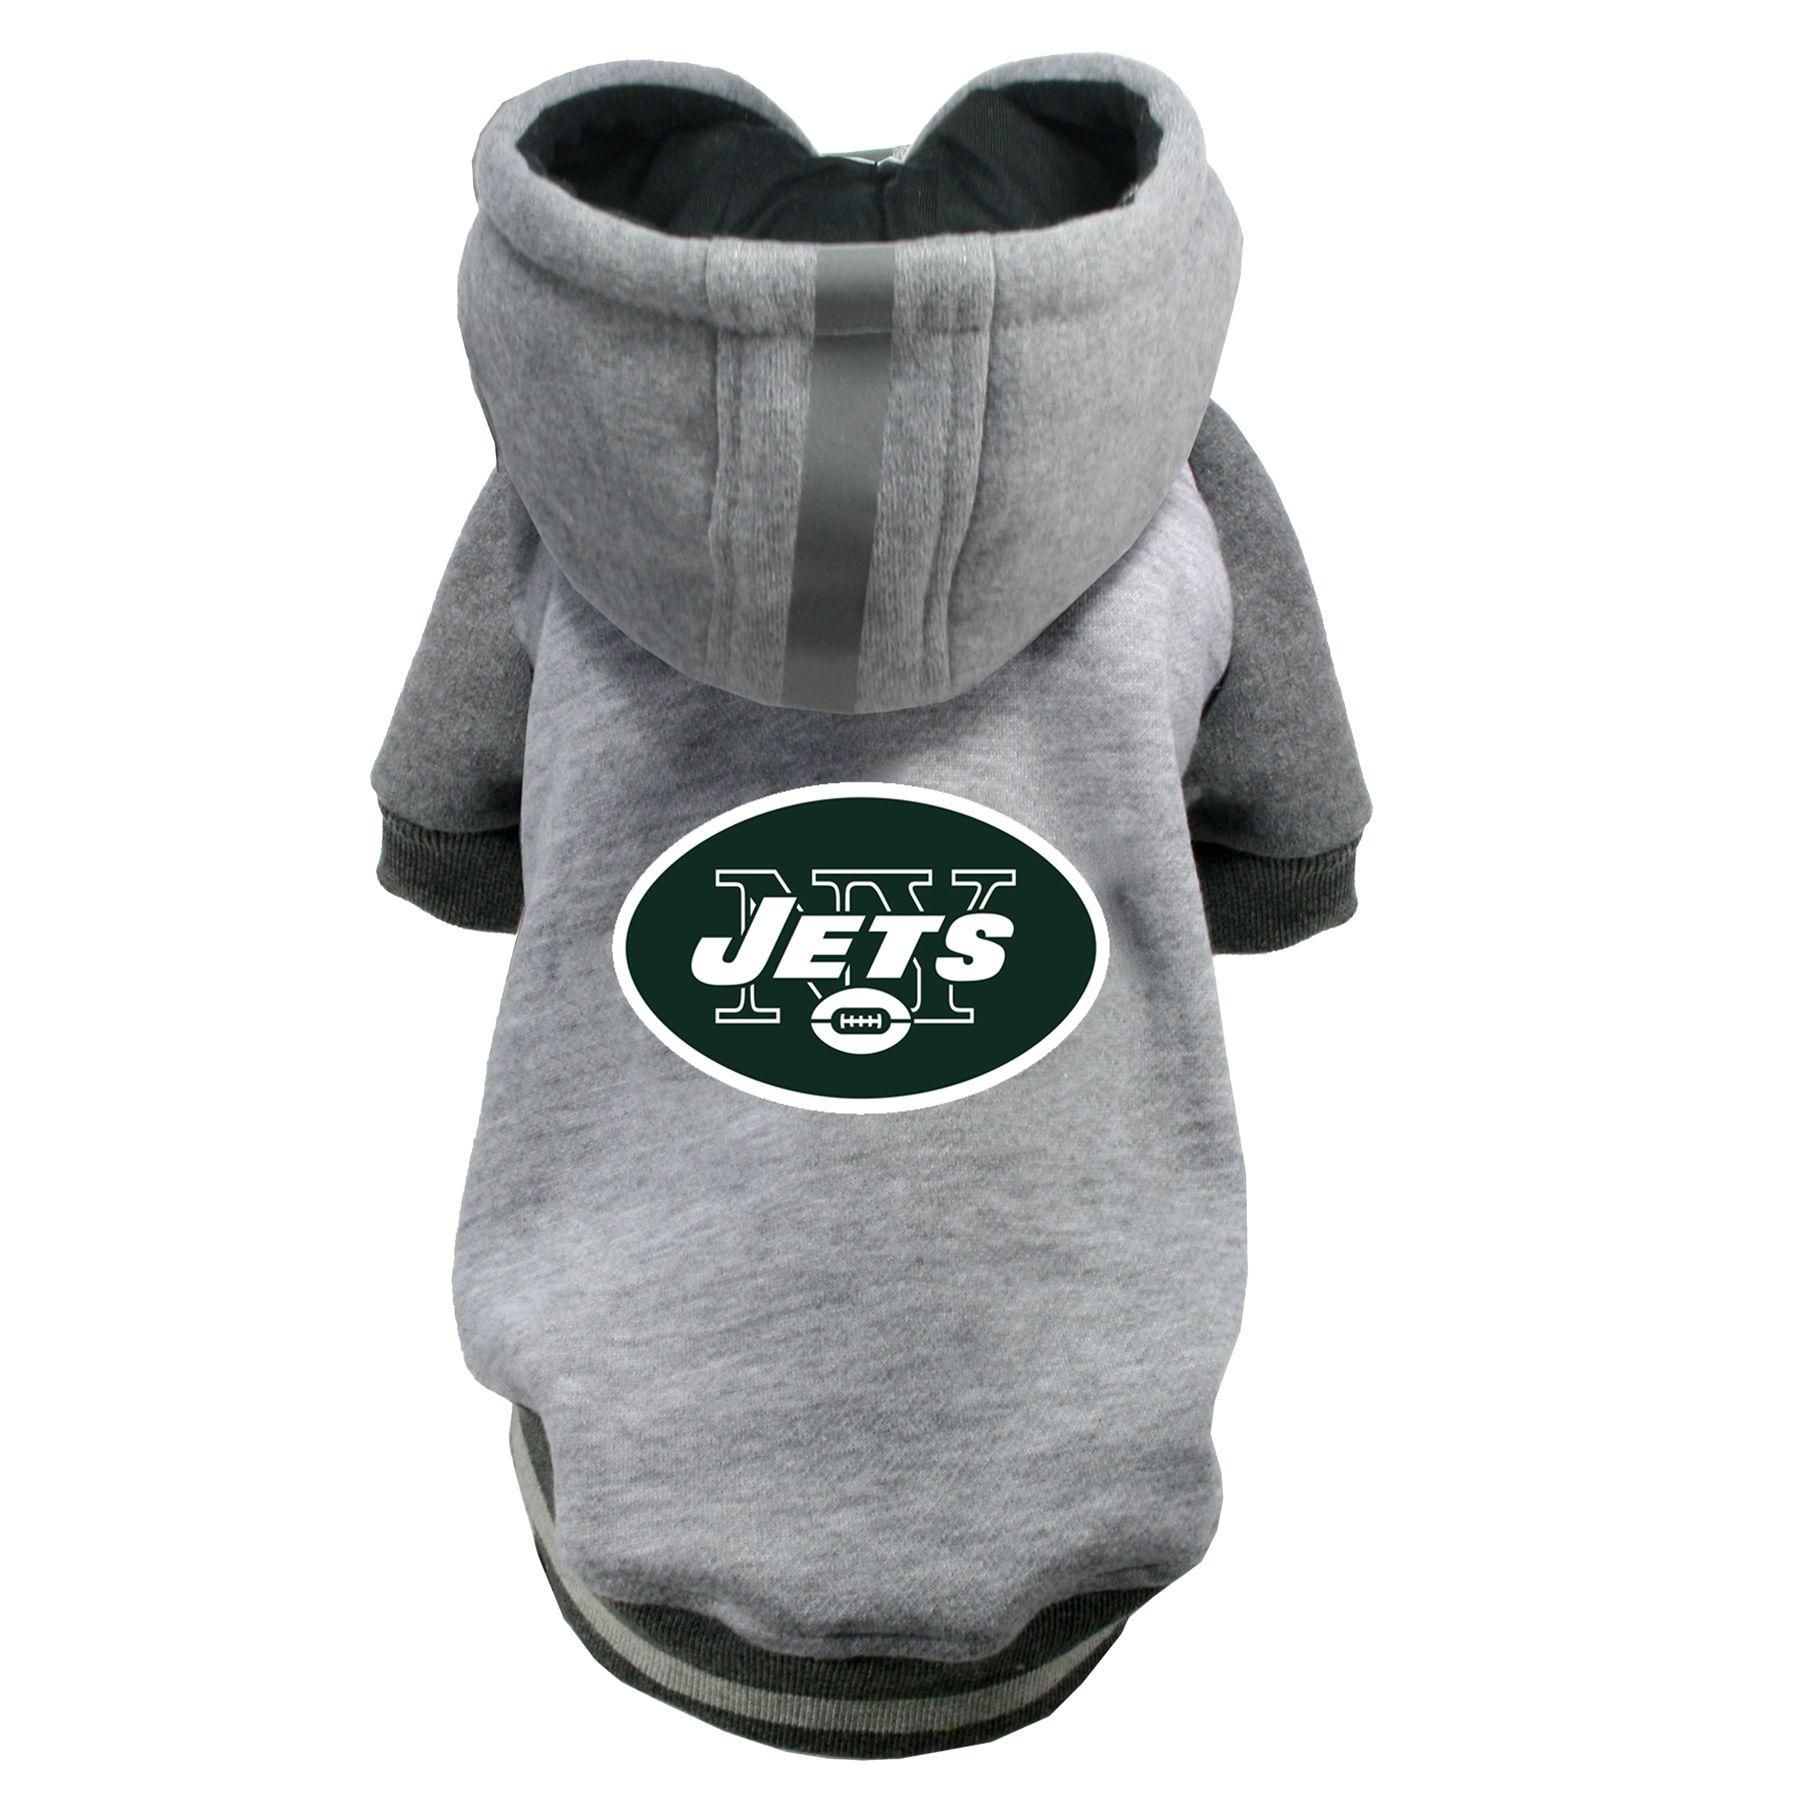 New York Jets NFL Hoodie size: Medium, Hip Doggie 5244325